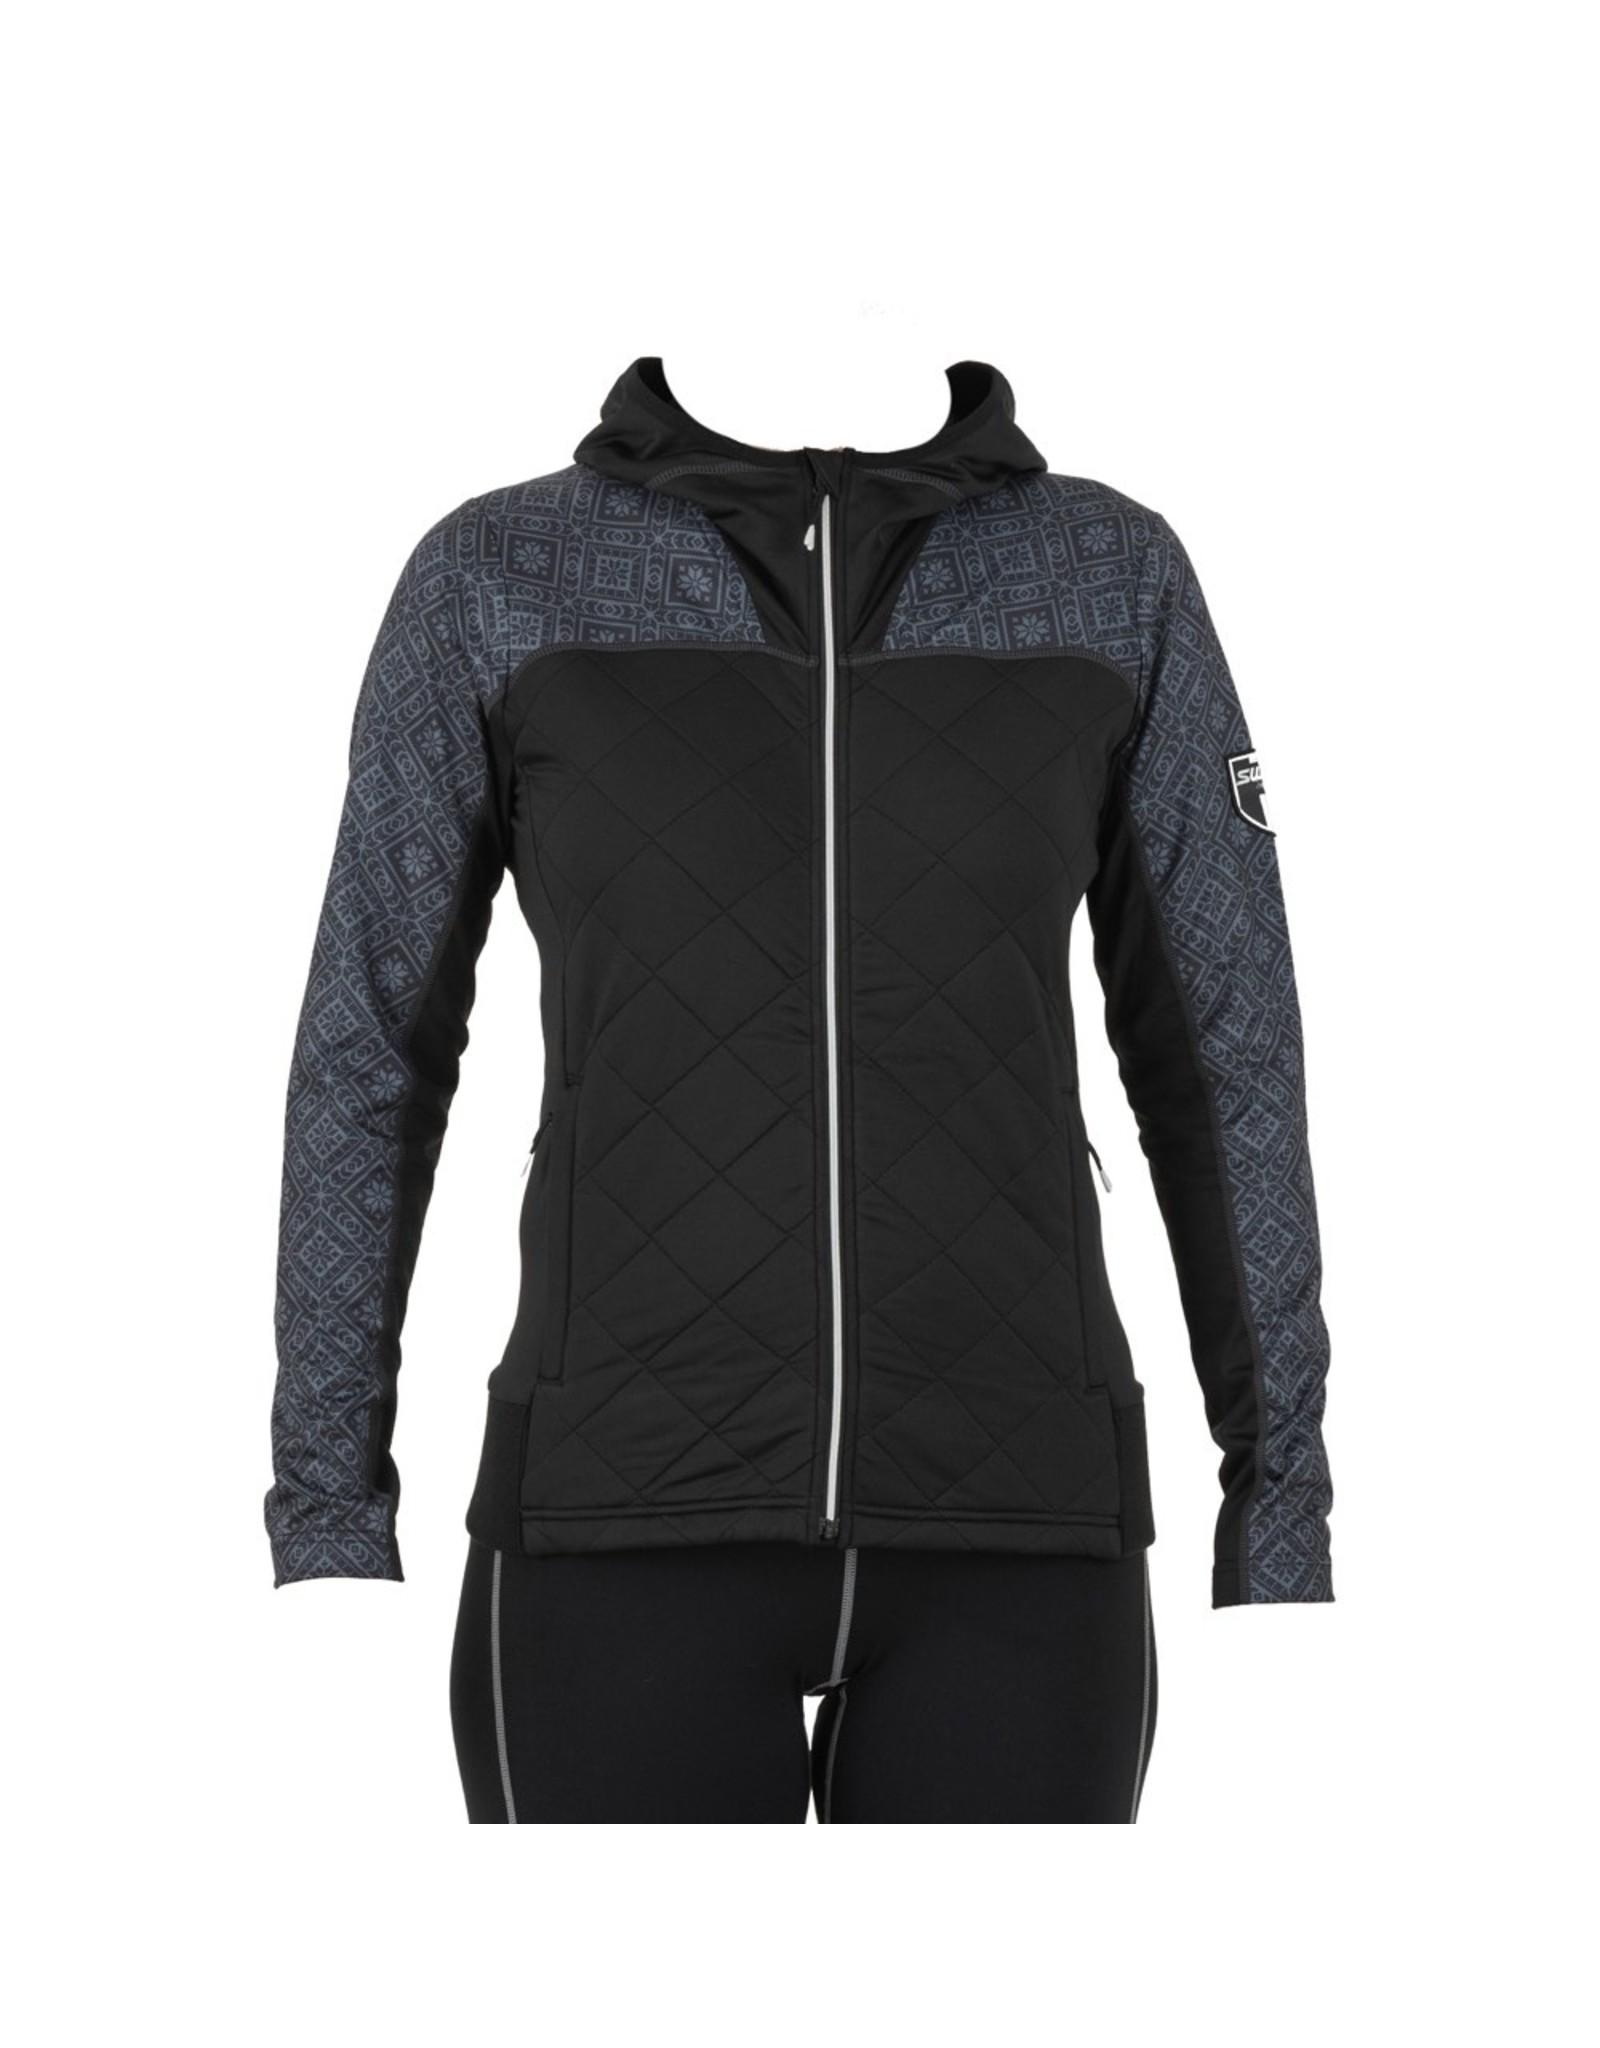 Swix Myrene Women's Full Zip Quilted Midlayer XL (10000) Black